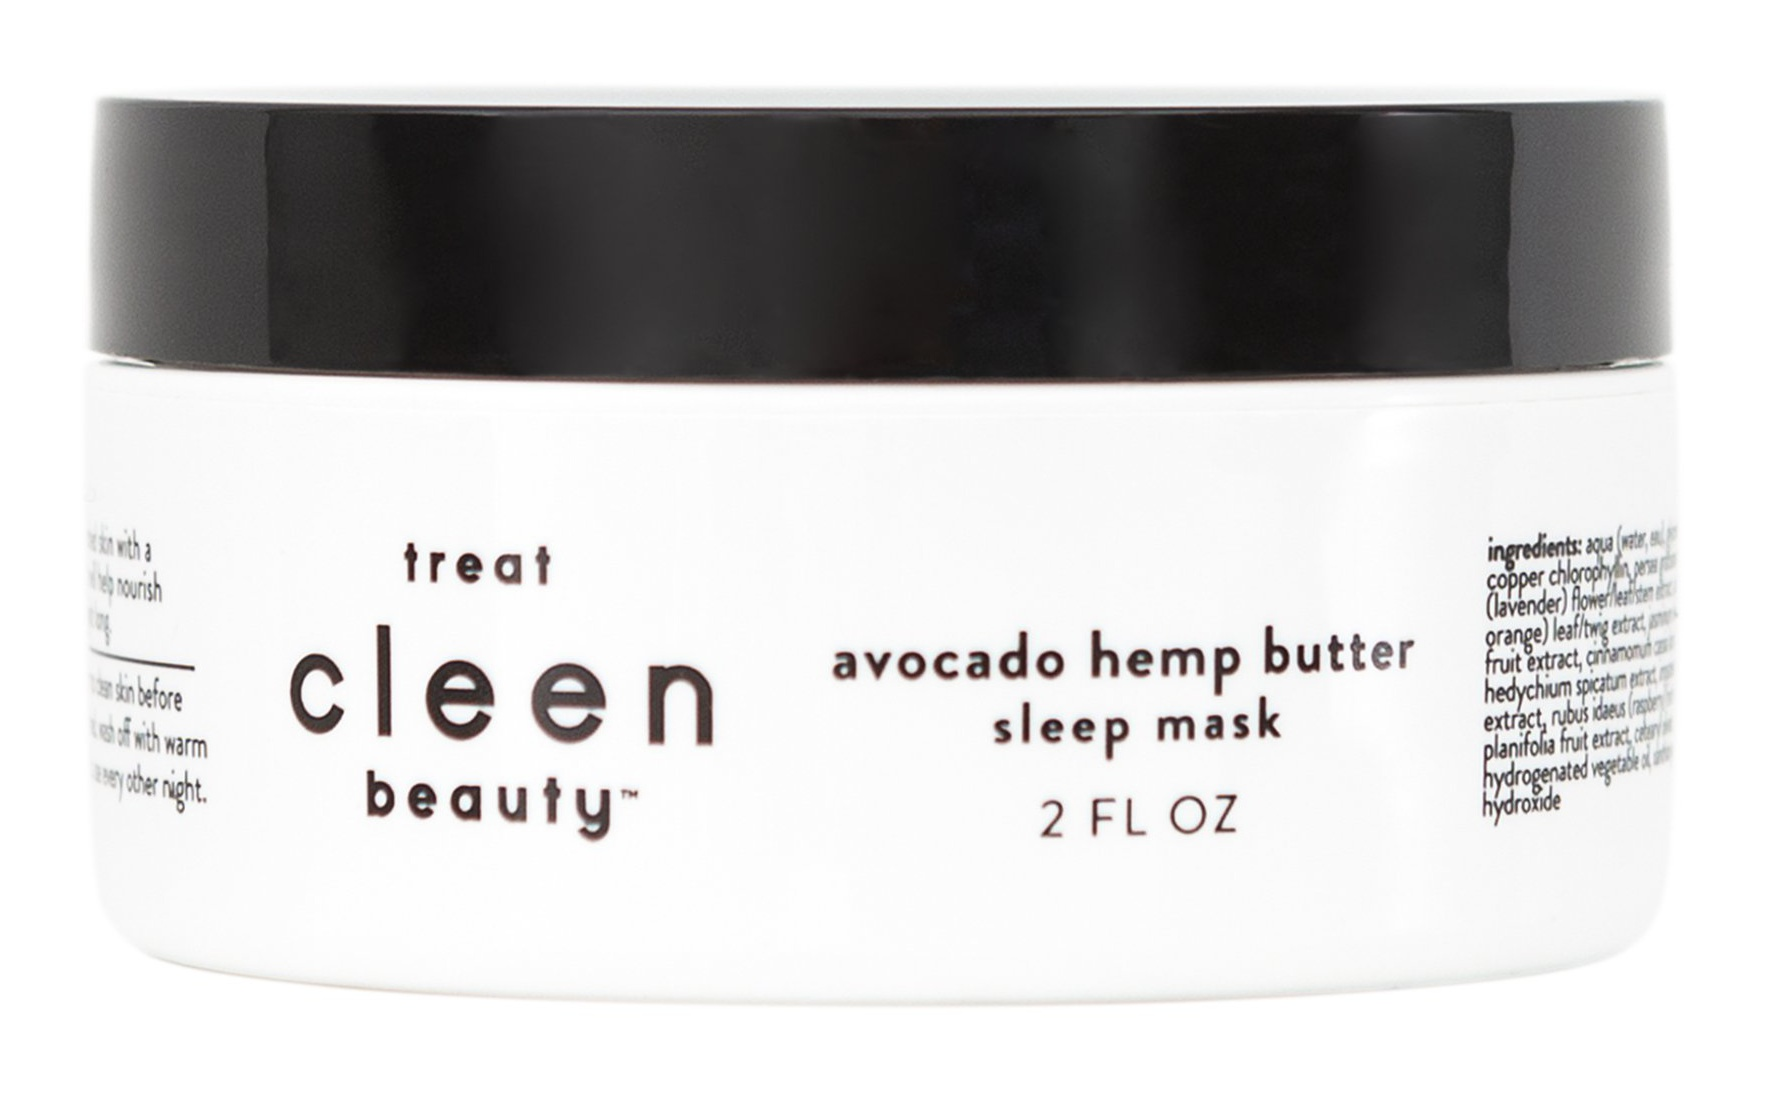 cleen beauty Sleep Mask With Avocado & Hemp Butter